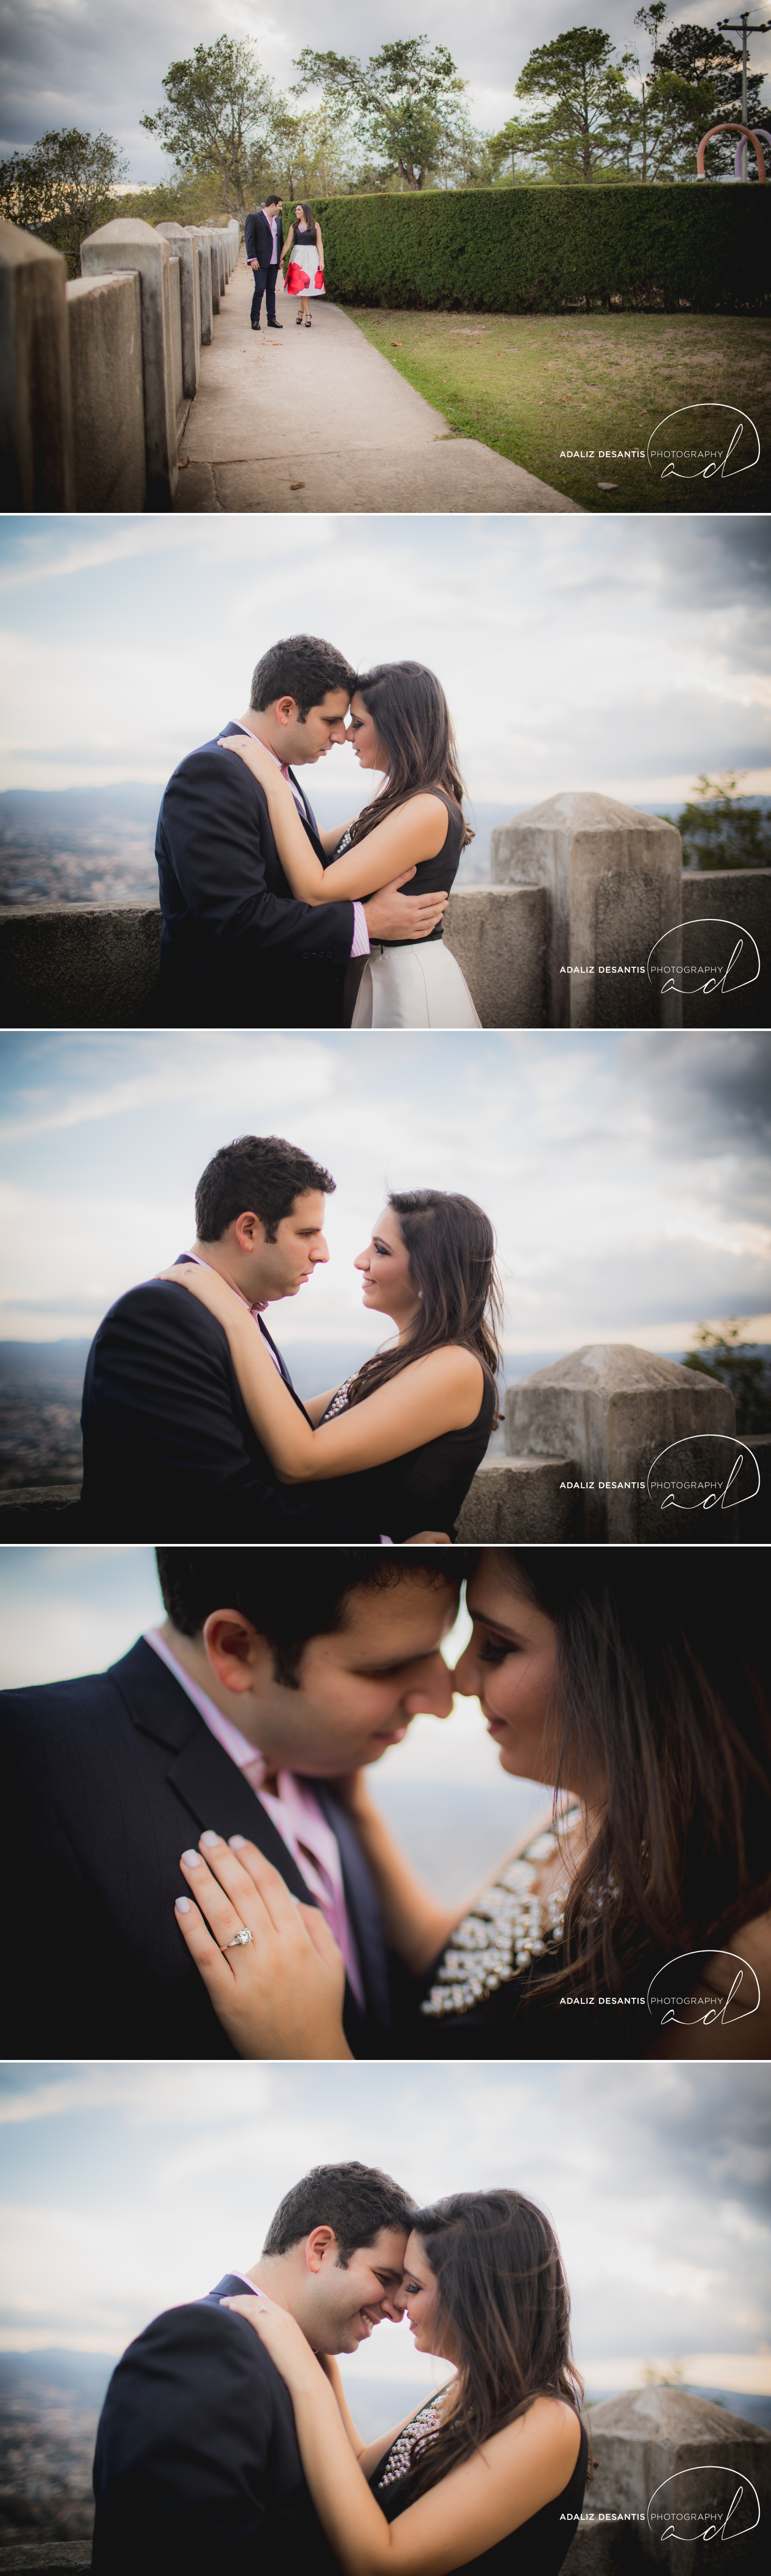 Lorette y Roger Engaged 9